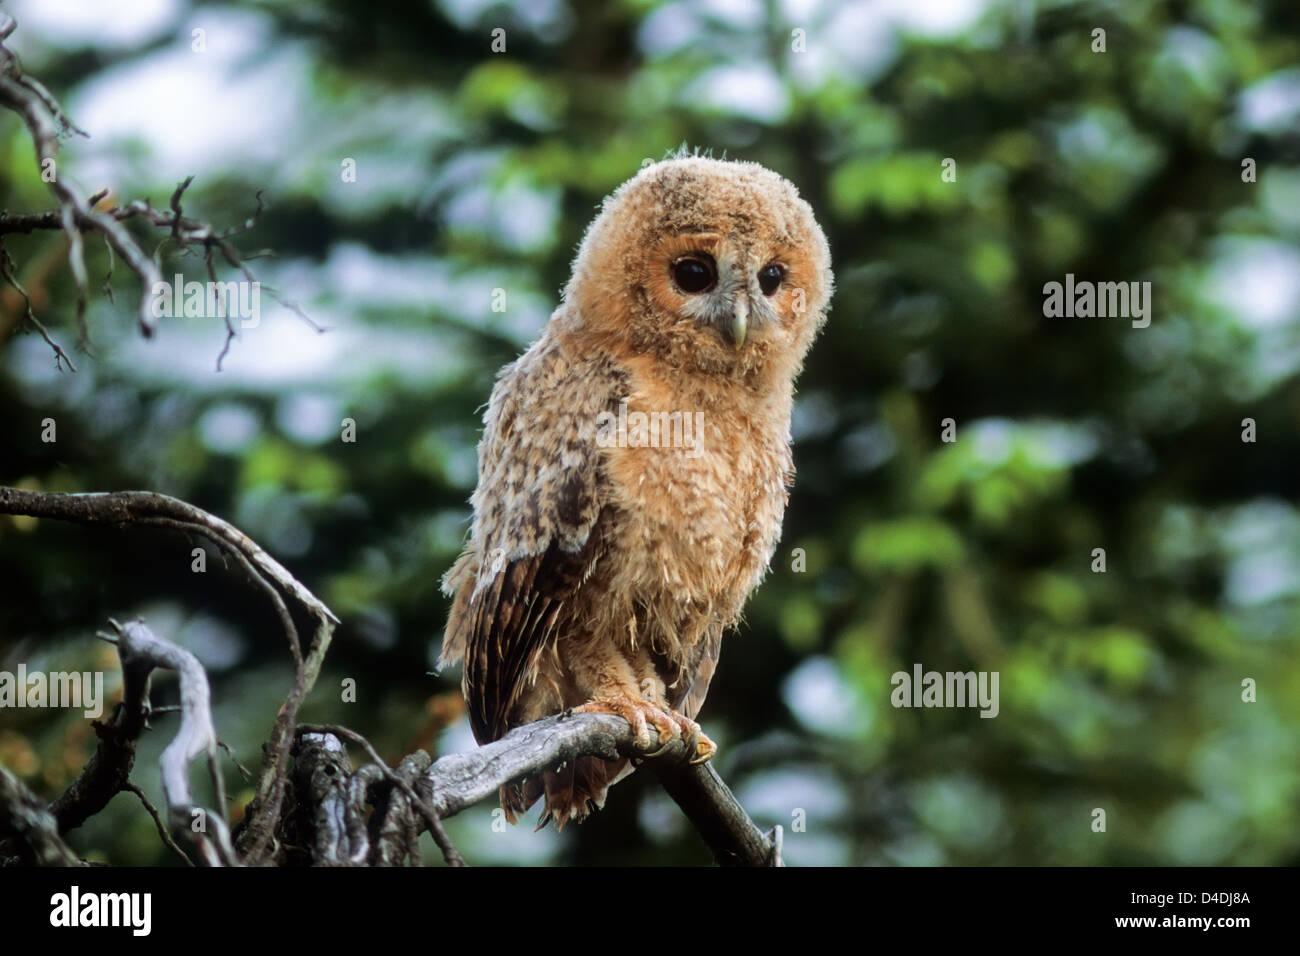 Waldkauz, Jungvogel (Strix aluco) Young Tawny Owl • Ostalbkreis, Baden-Württemberg; Deutschland, Germany Stock Photo